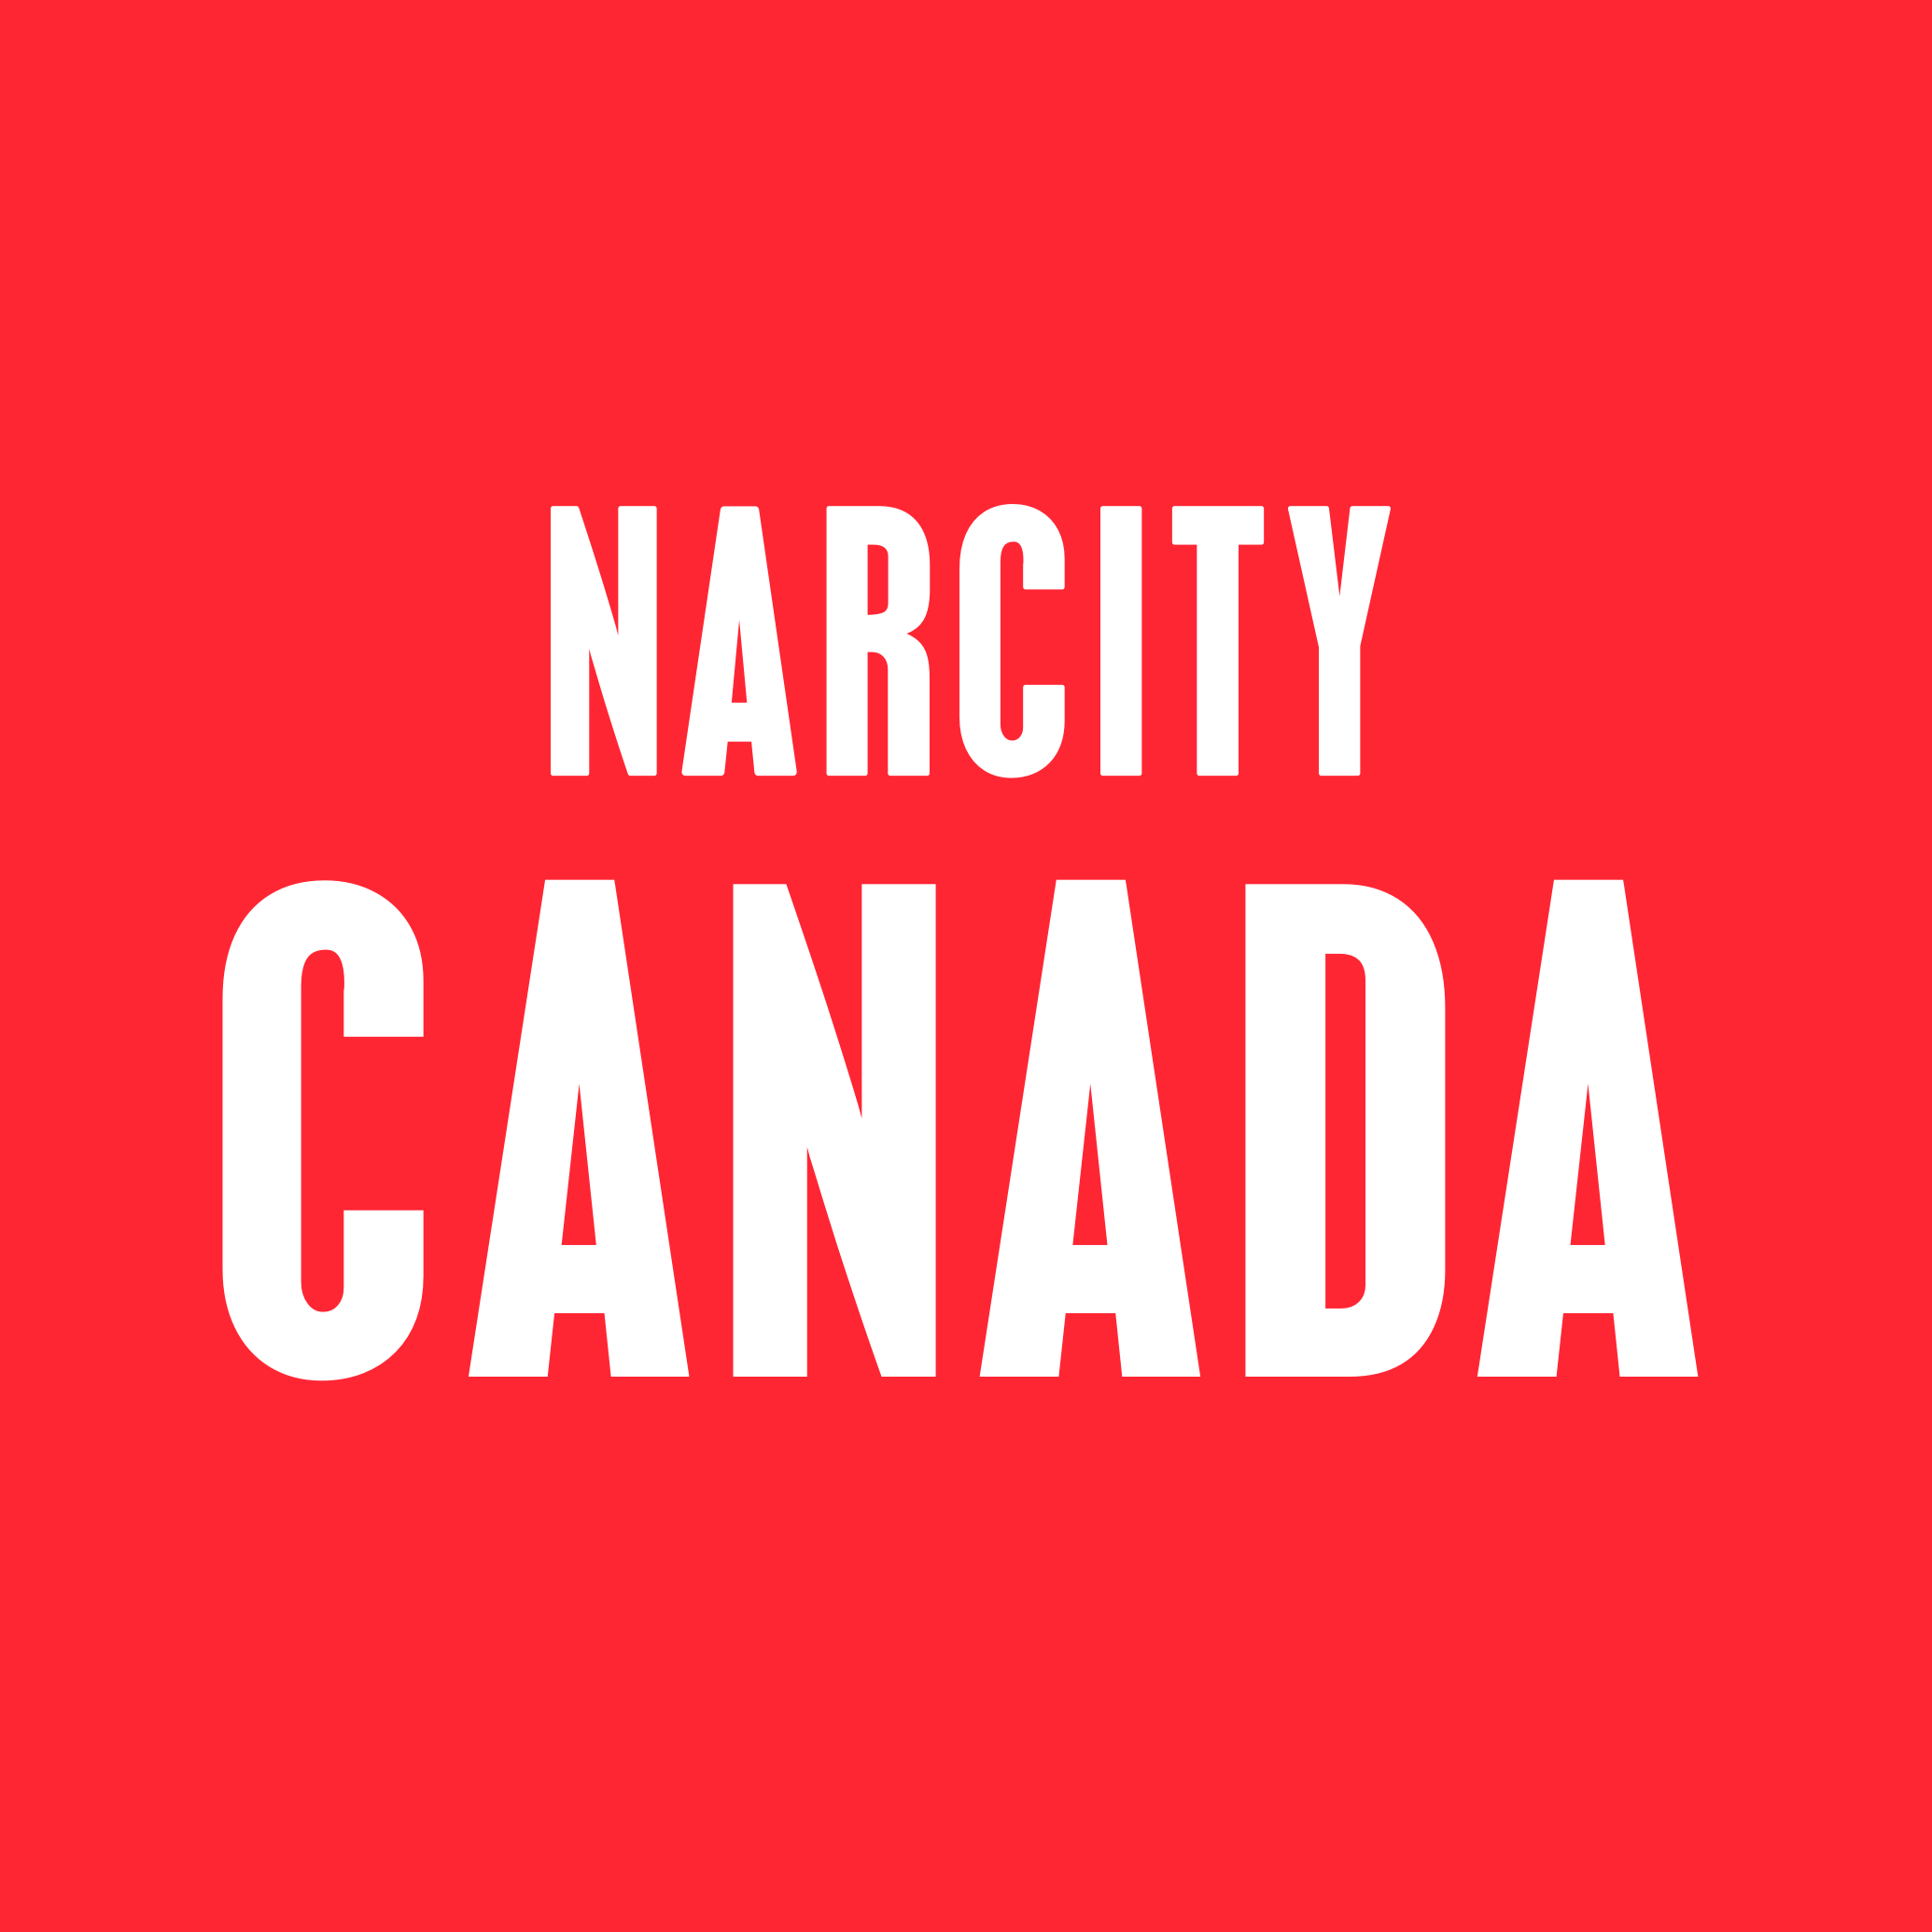 Narcity Canada